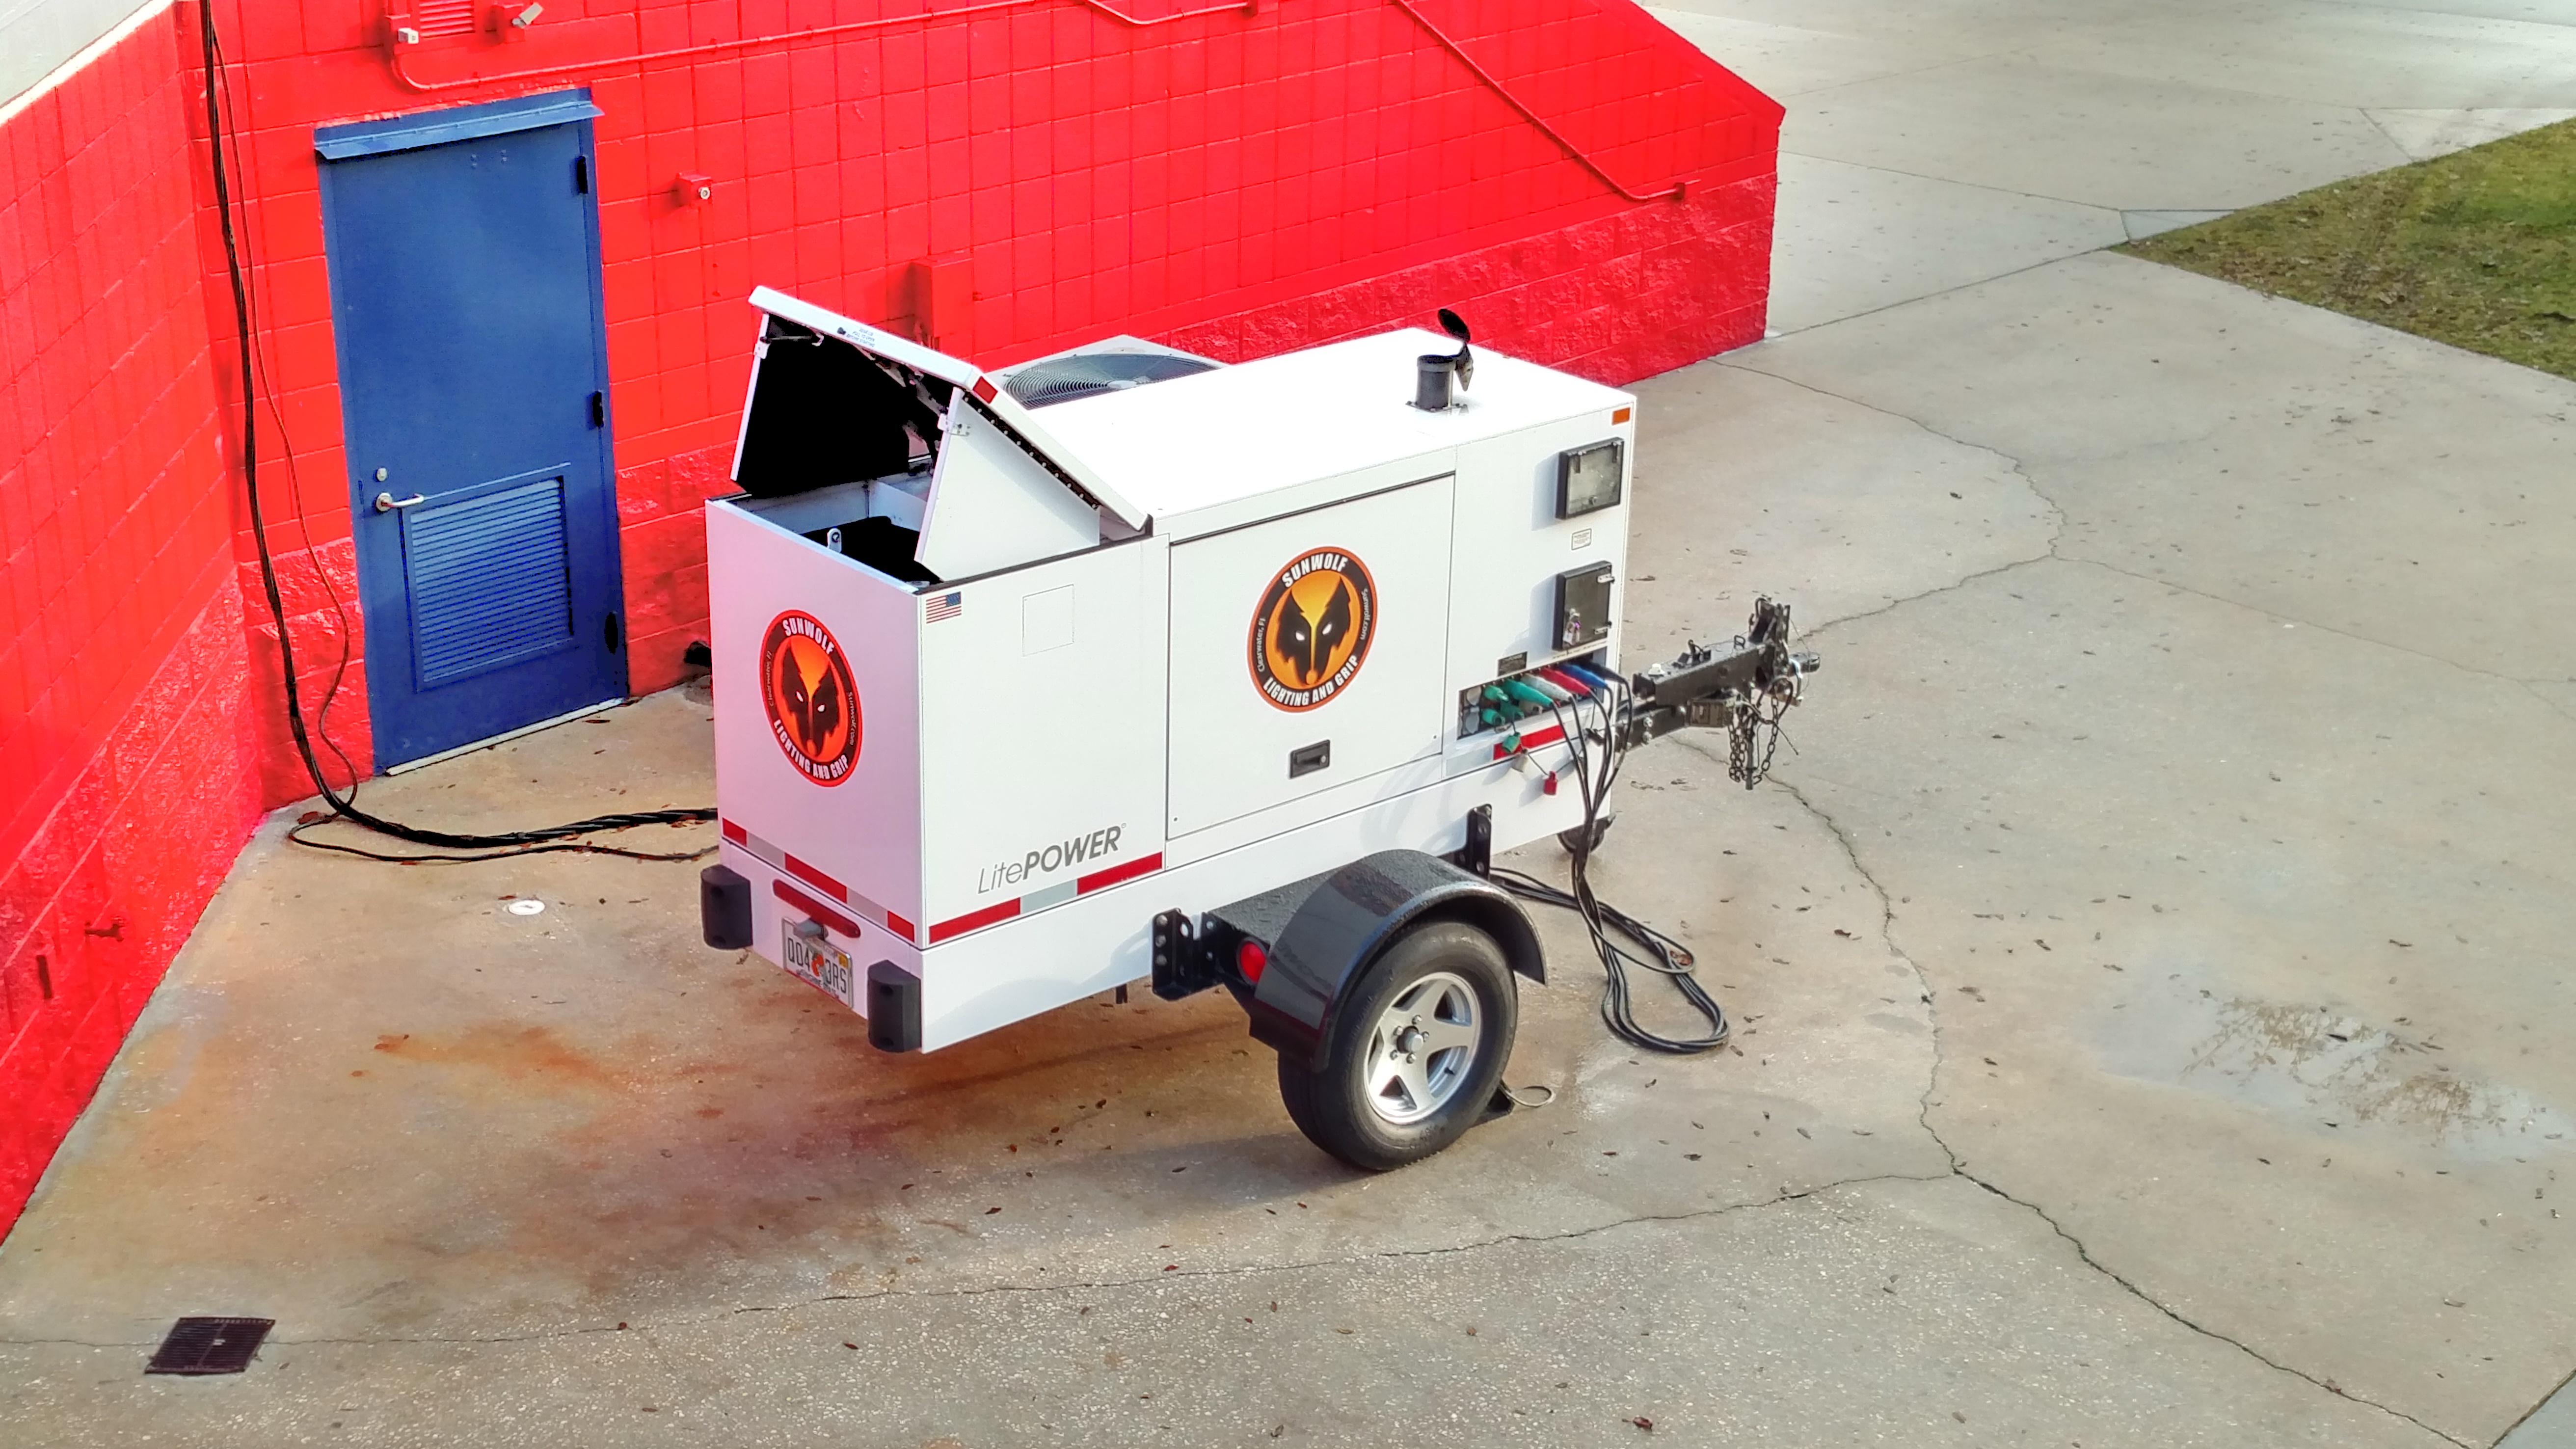 LitePower Florida Generator